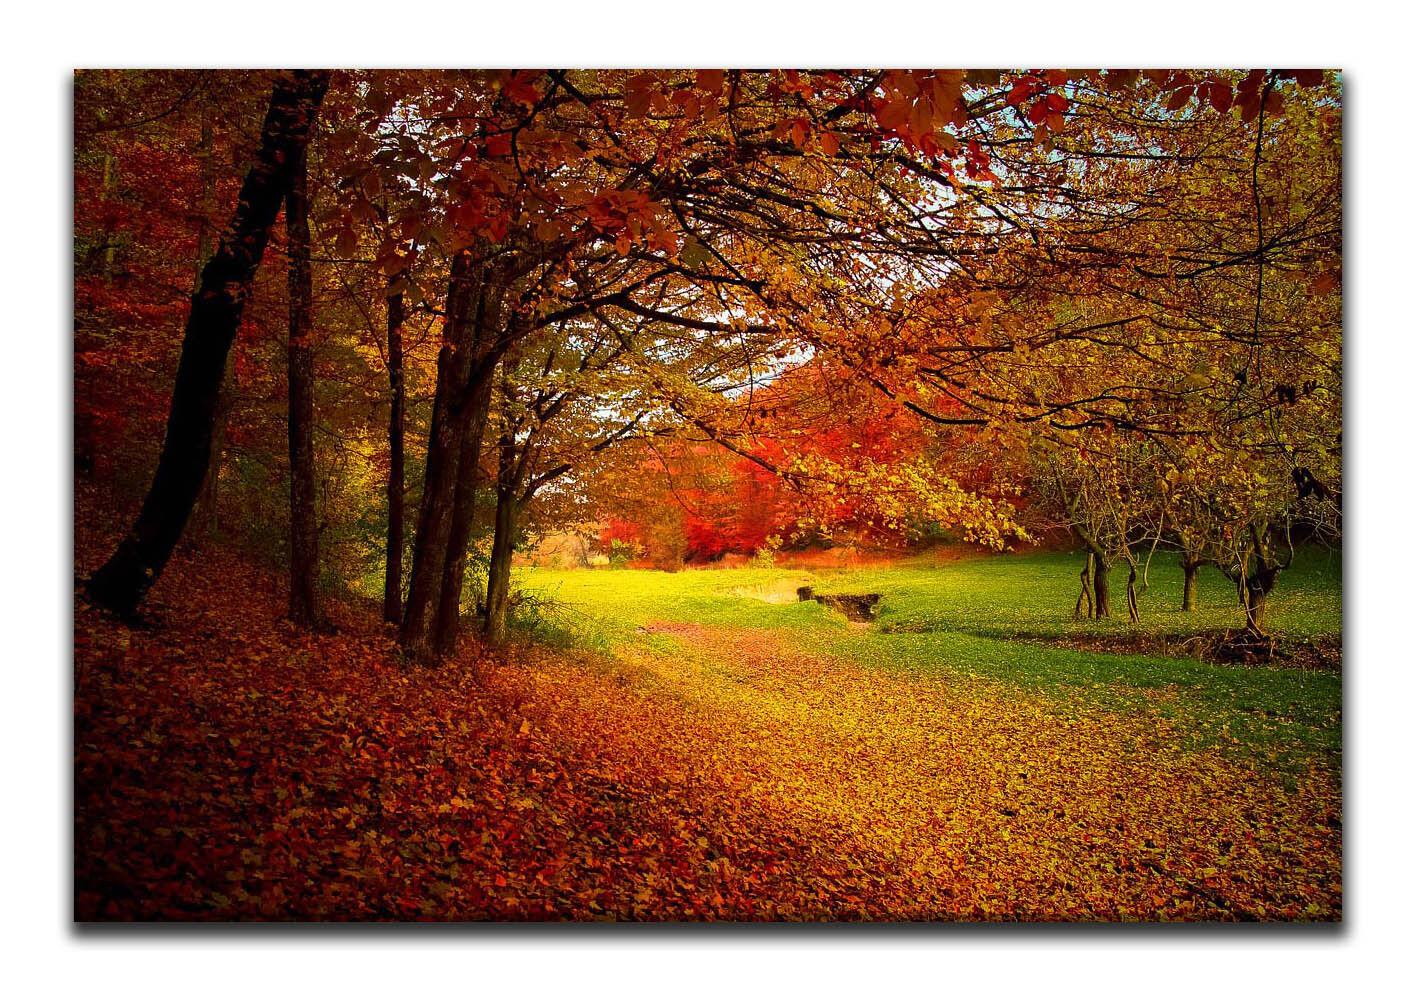 Leinwand Bild Wandbild Keilrahmenbild Herbst  Bäume Natur Wald Landschaft